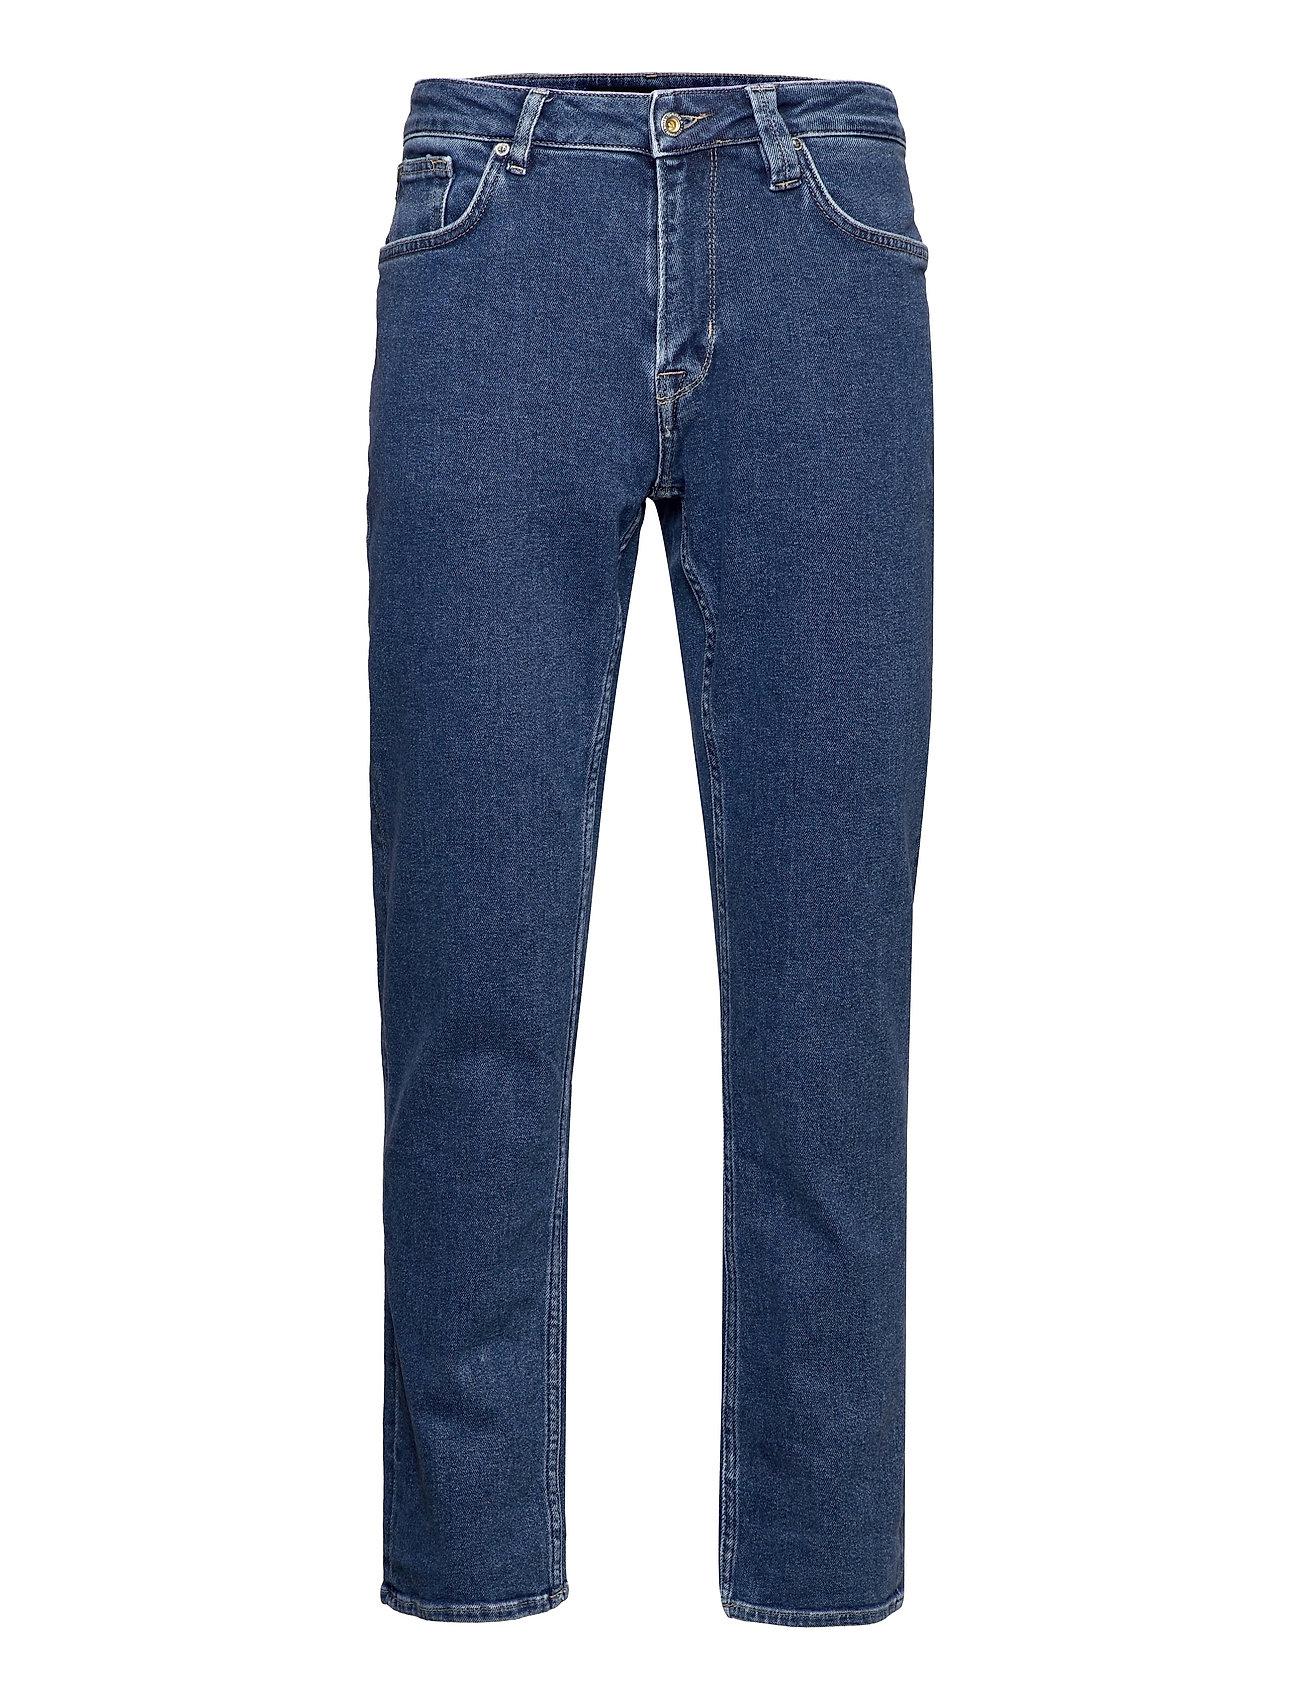 Image of Math K3868 Jeans Jeans Blå Gabba (3551194895)